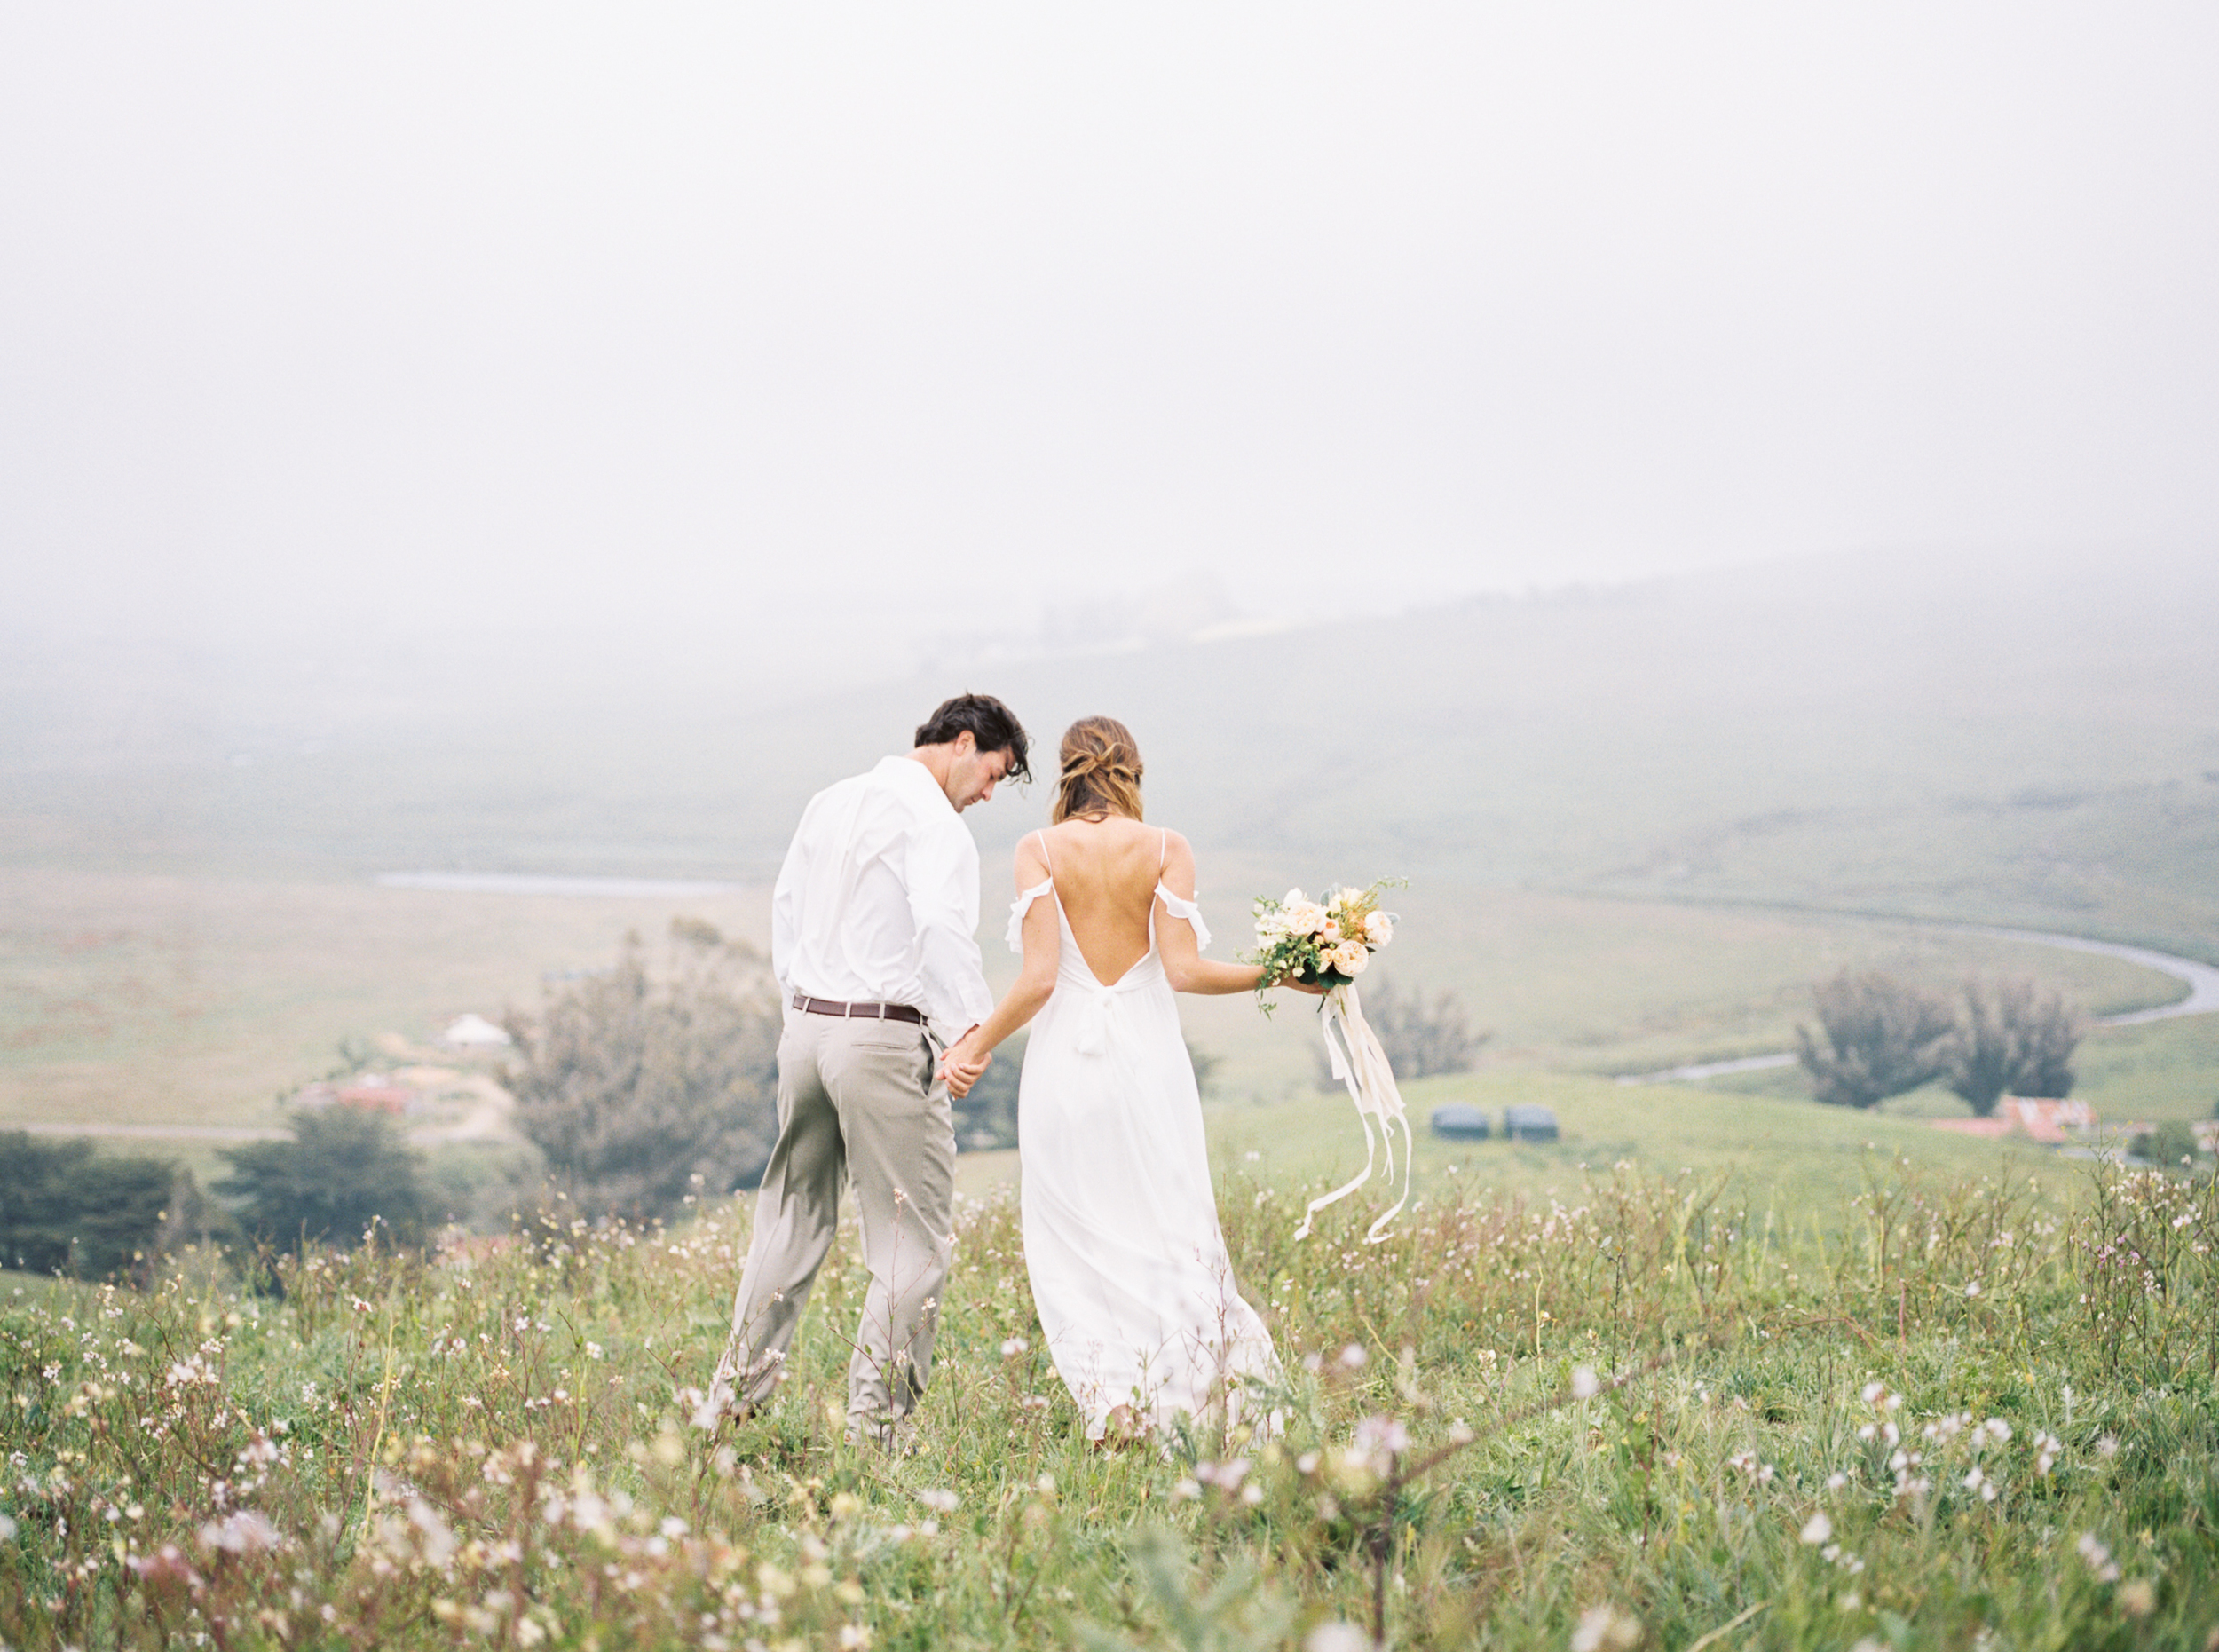 Danford-Photography-Bozeman-Montana-California-Wedding-Engagement-Photographer-40.jpg